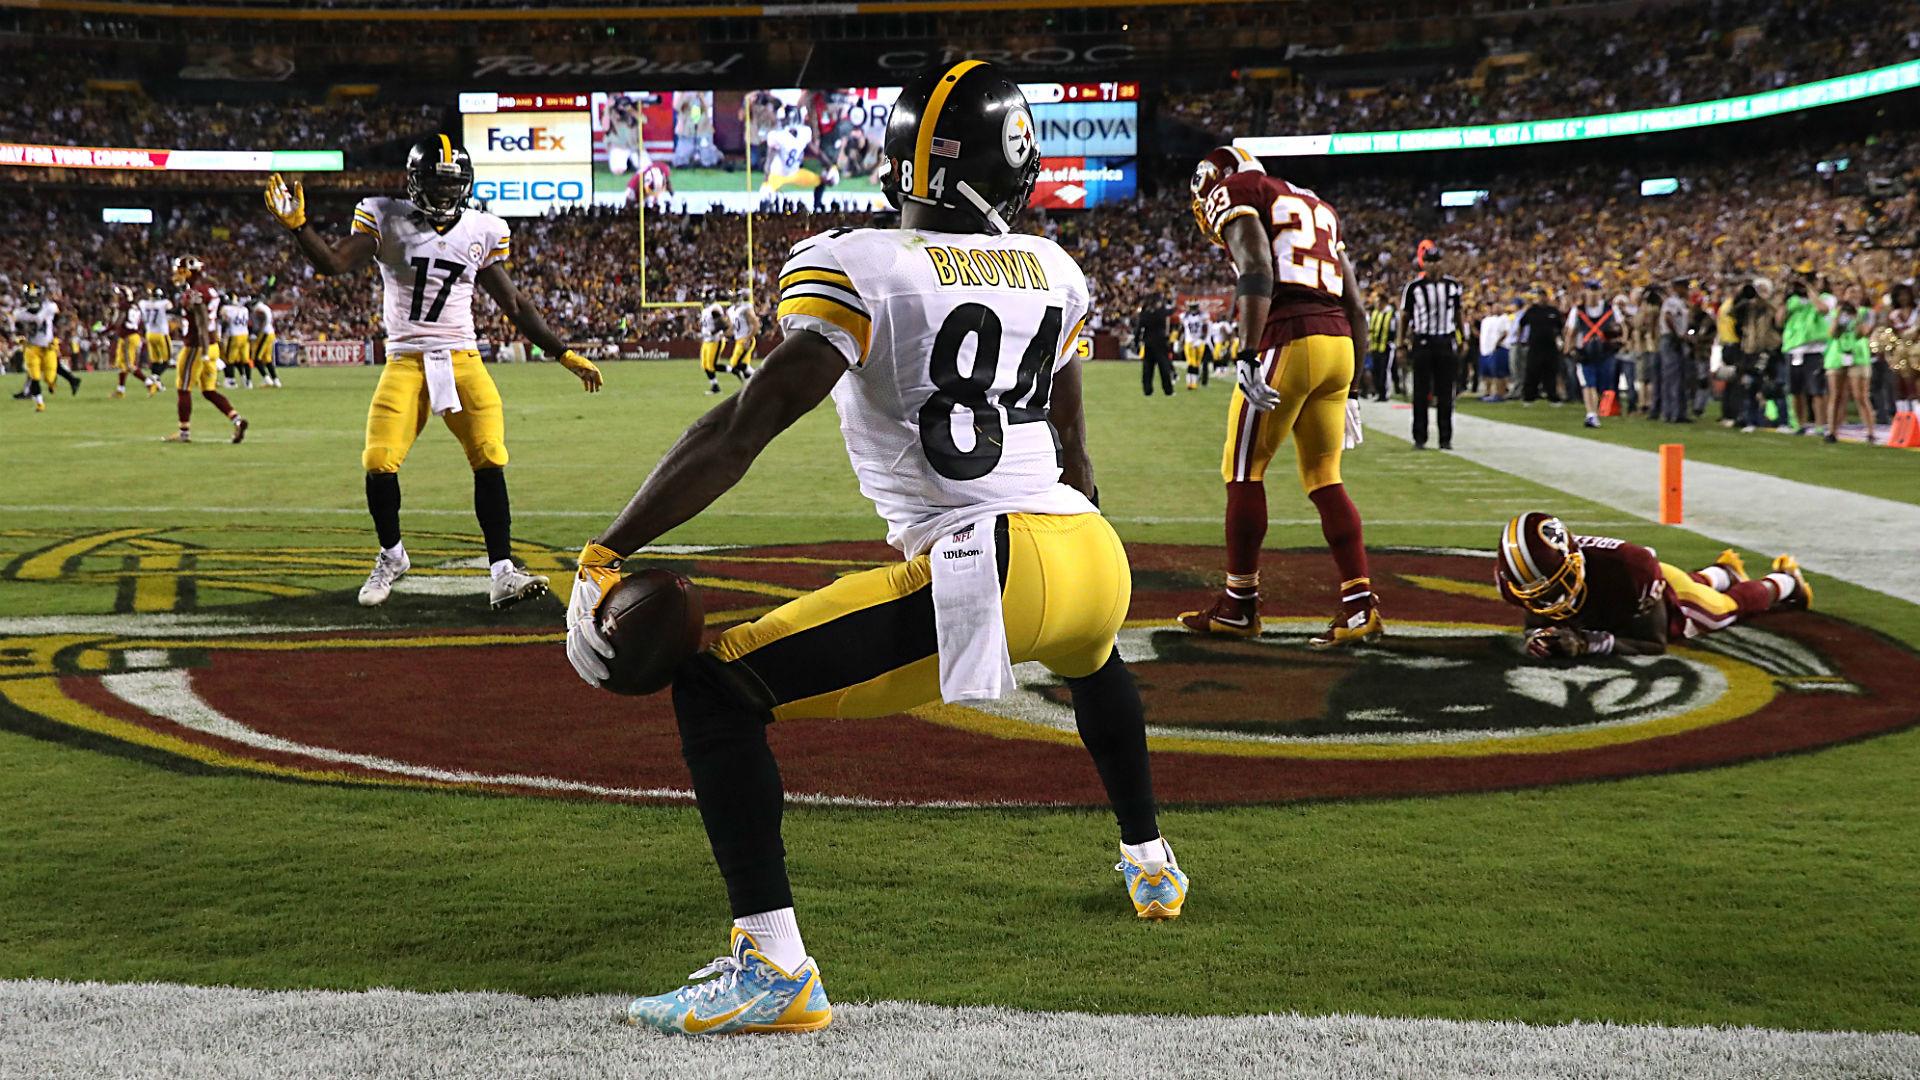 Antonio Brown's twerking celebration was worth the 15-yard penalty | NFL |  Sporting News